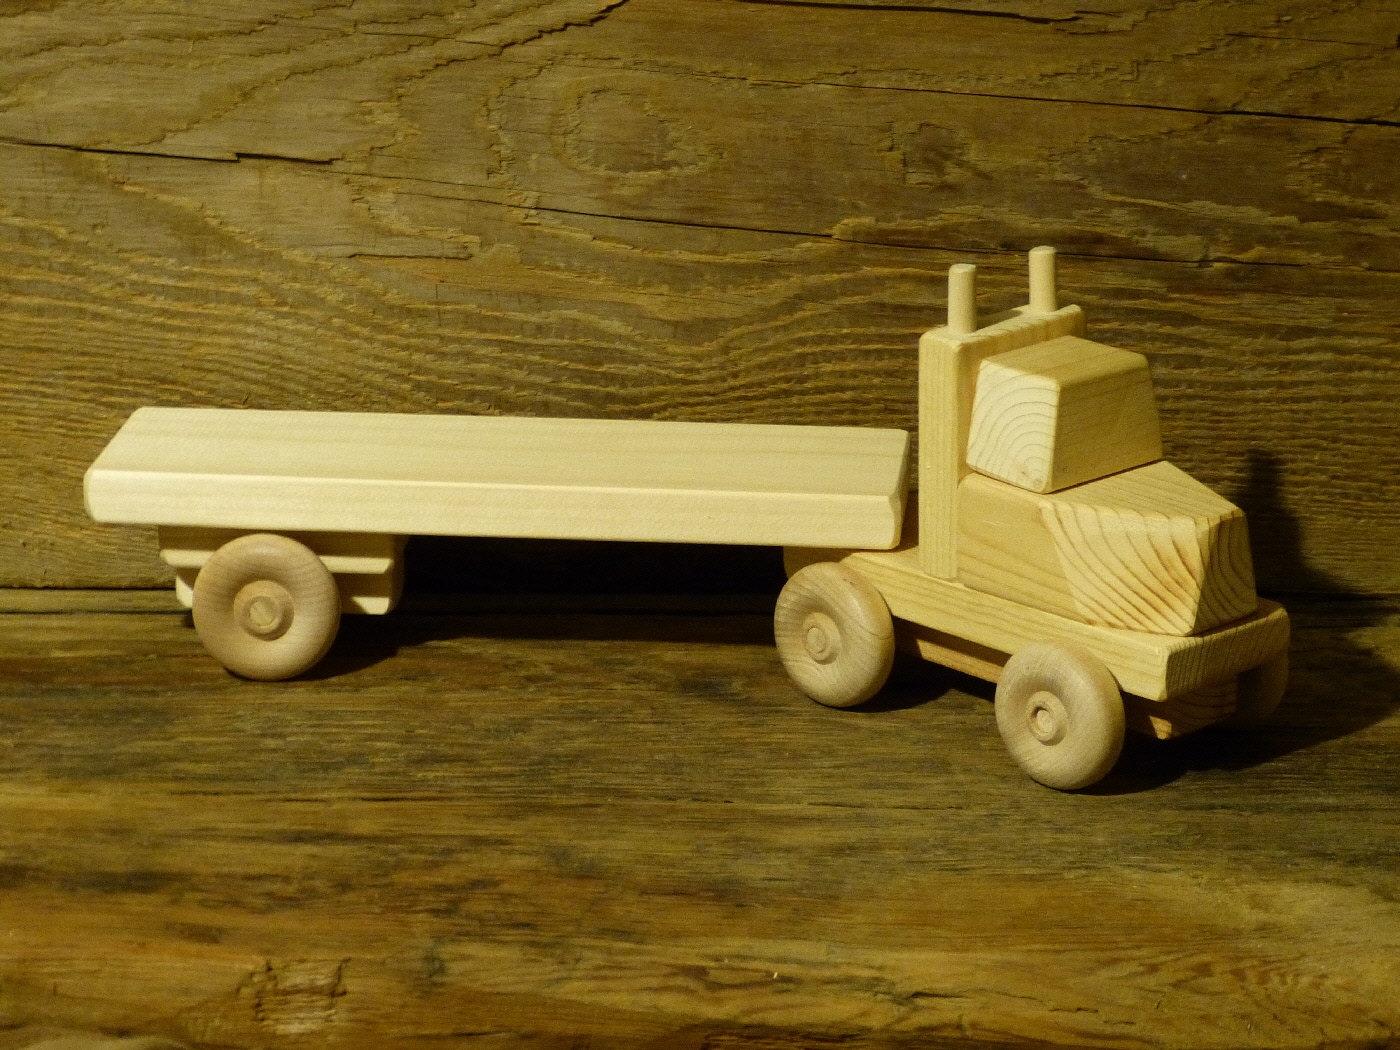 Hecho a mano carro juguete madera plana verde Trailer